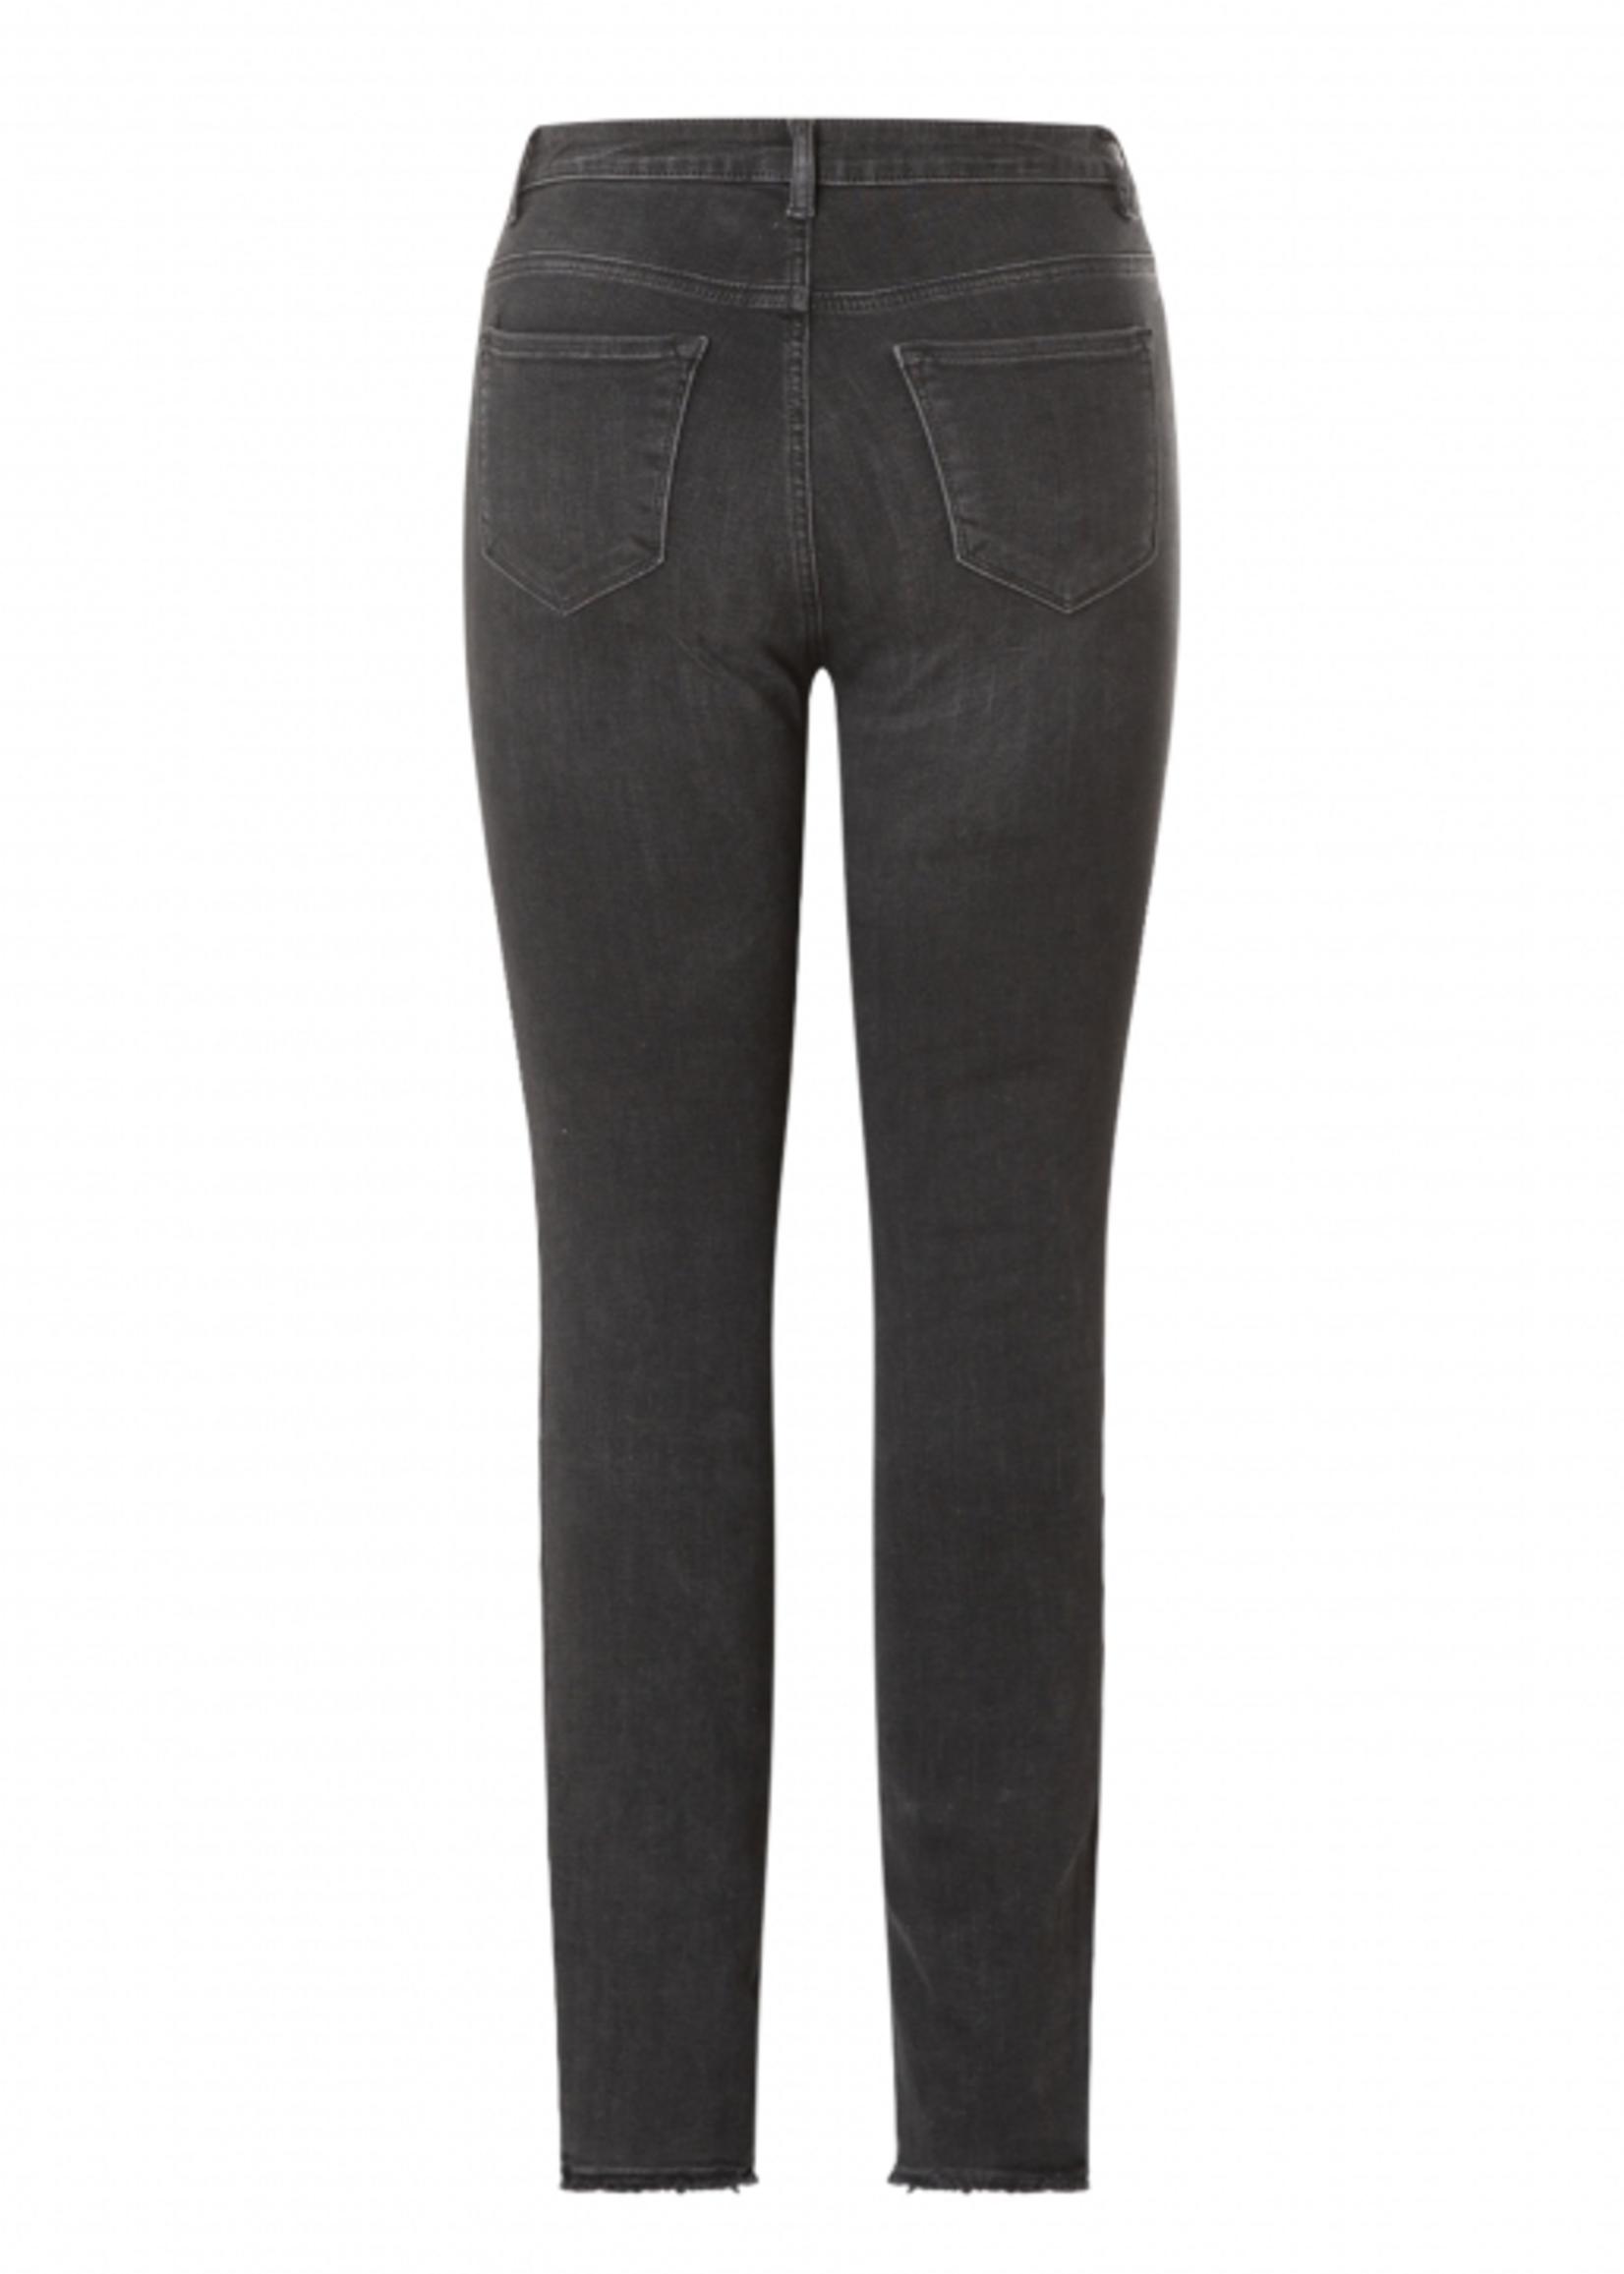 Yest Yest Ann Jeans